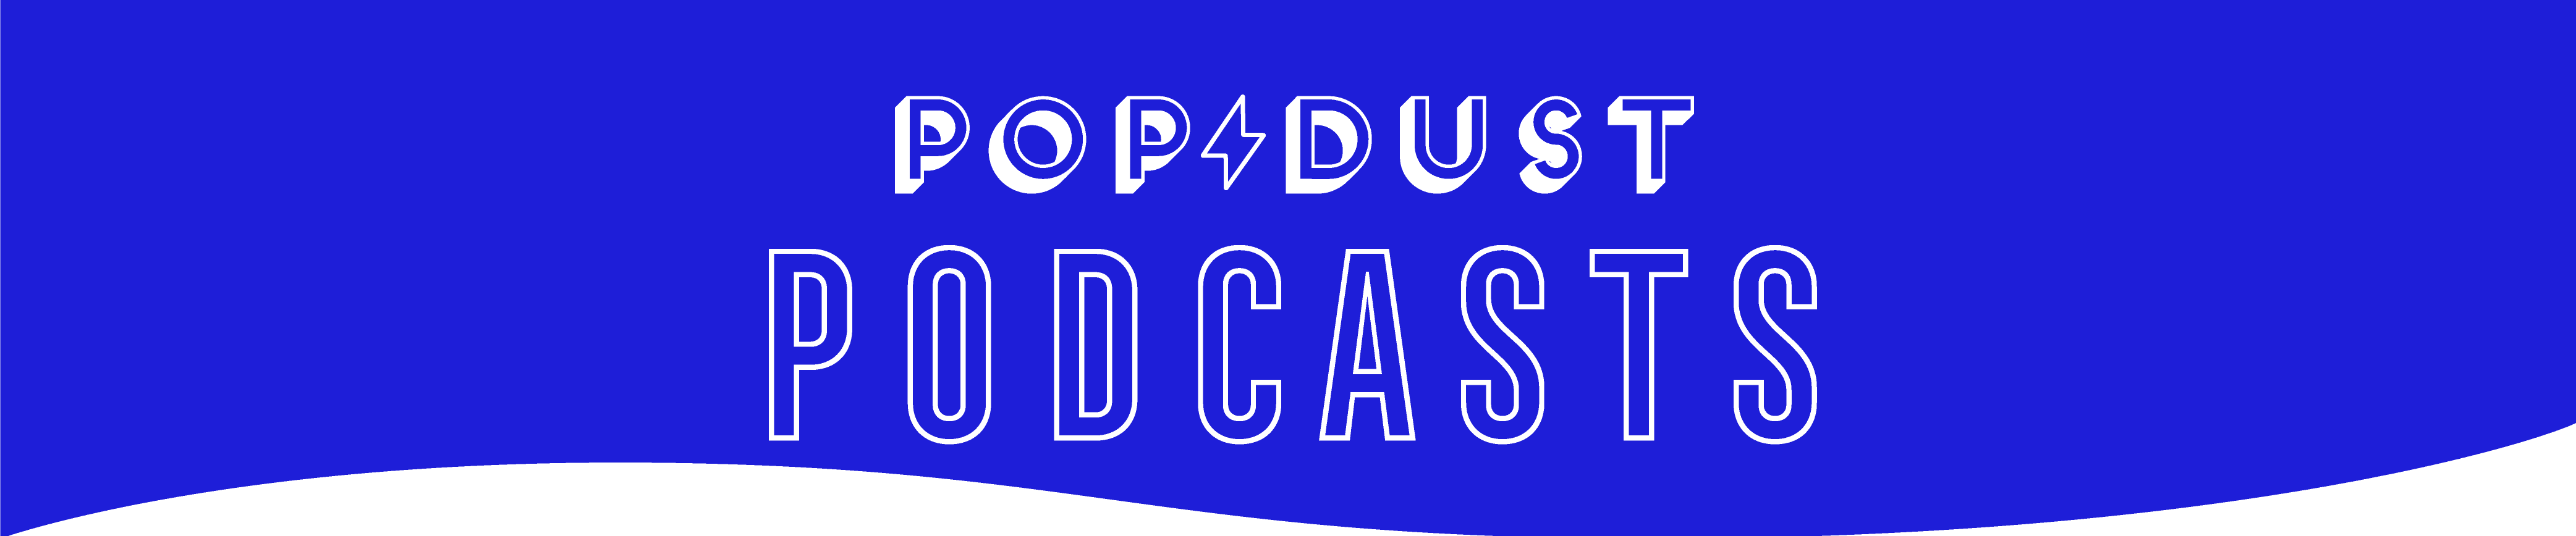 Popdust podcasts